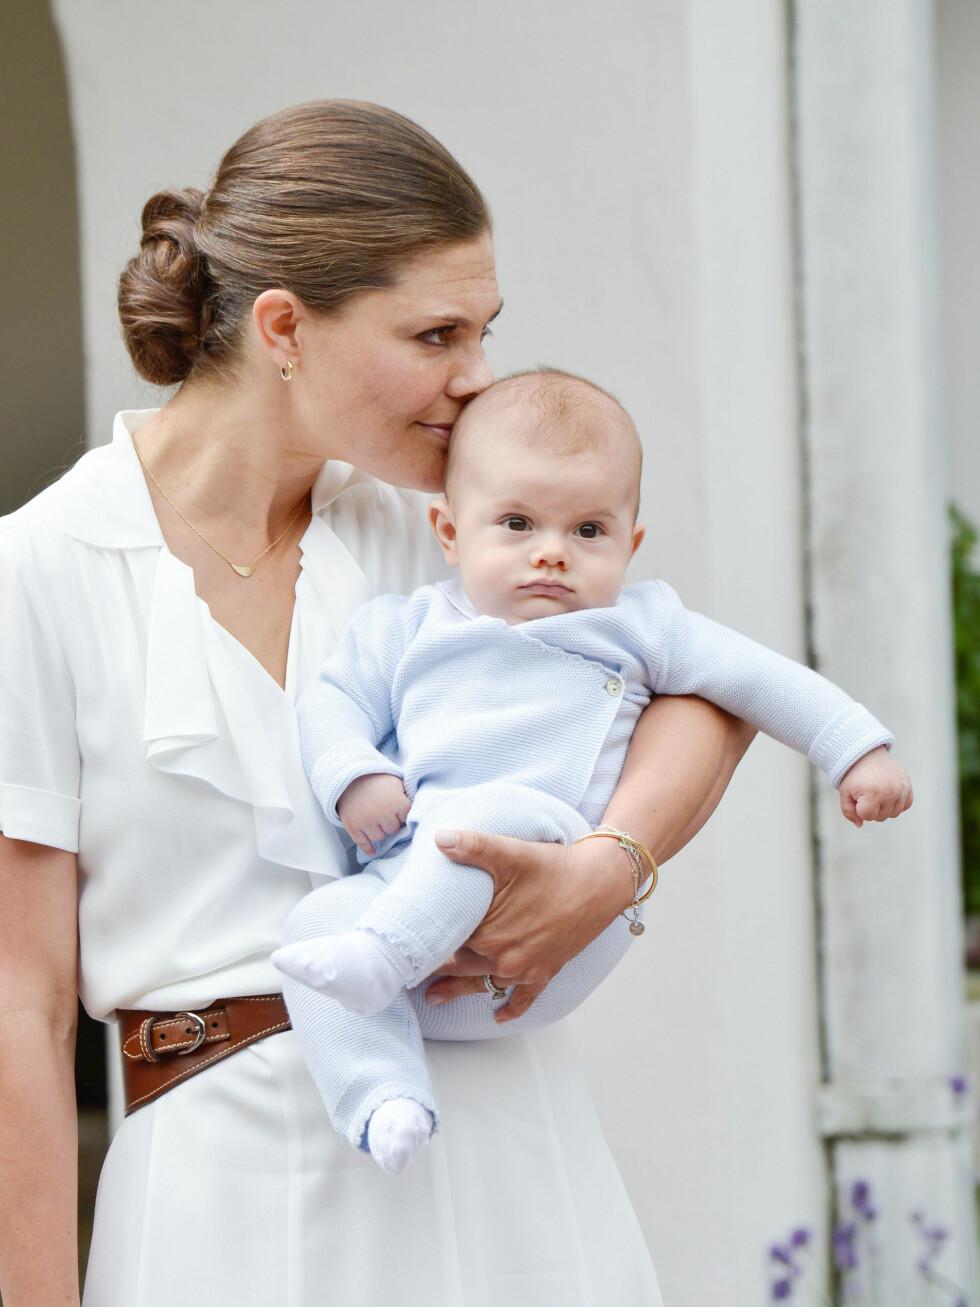 MORSKJÆRLIGHET: Kronprinsesse Victoria med sønnen prins Oscar på Solliden slott i forbindelse med 39-årsdagen hennes i juli 2016. FOTO: NTB Scanpix